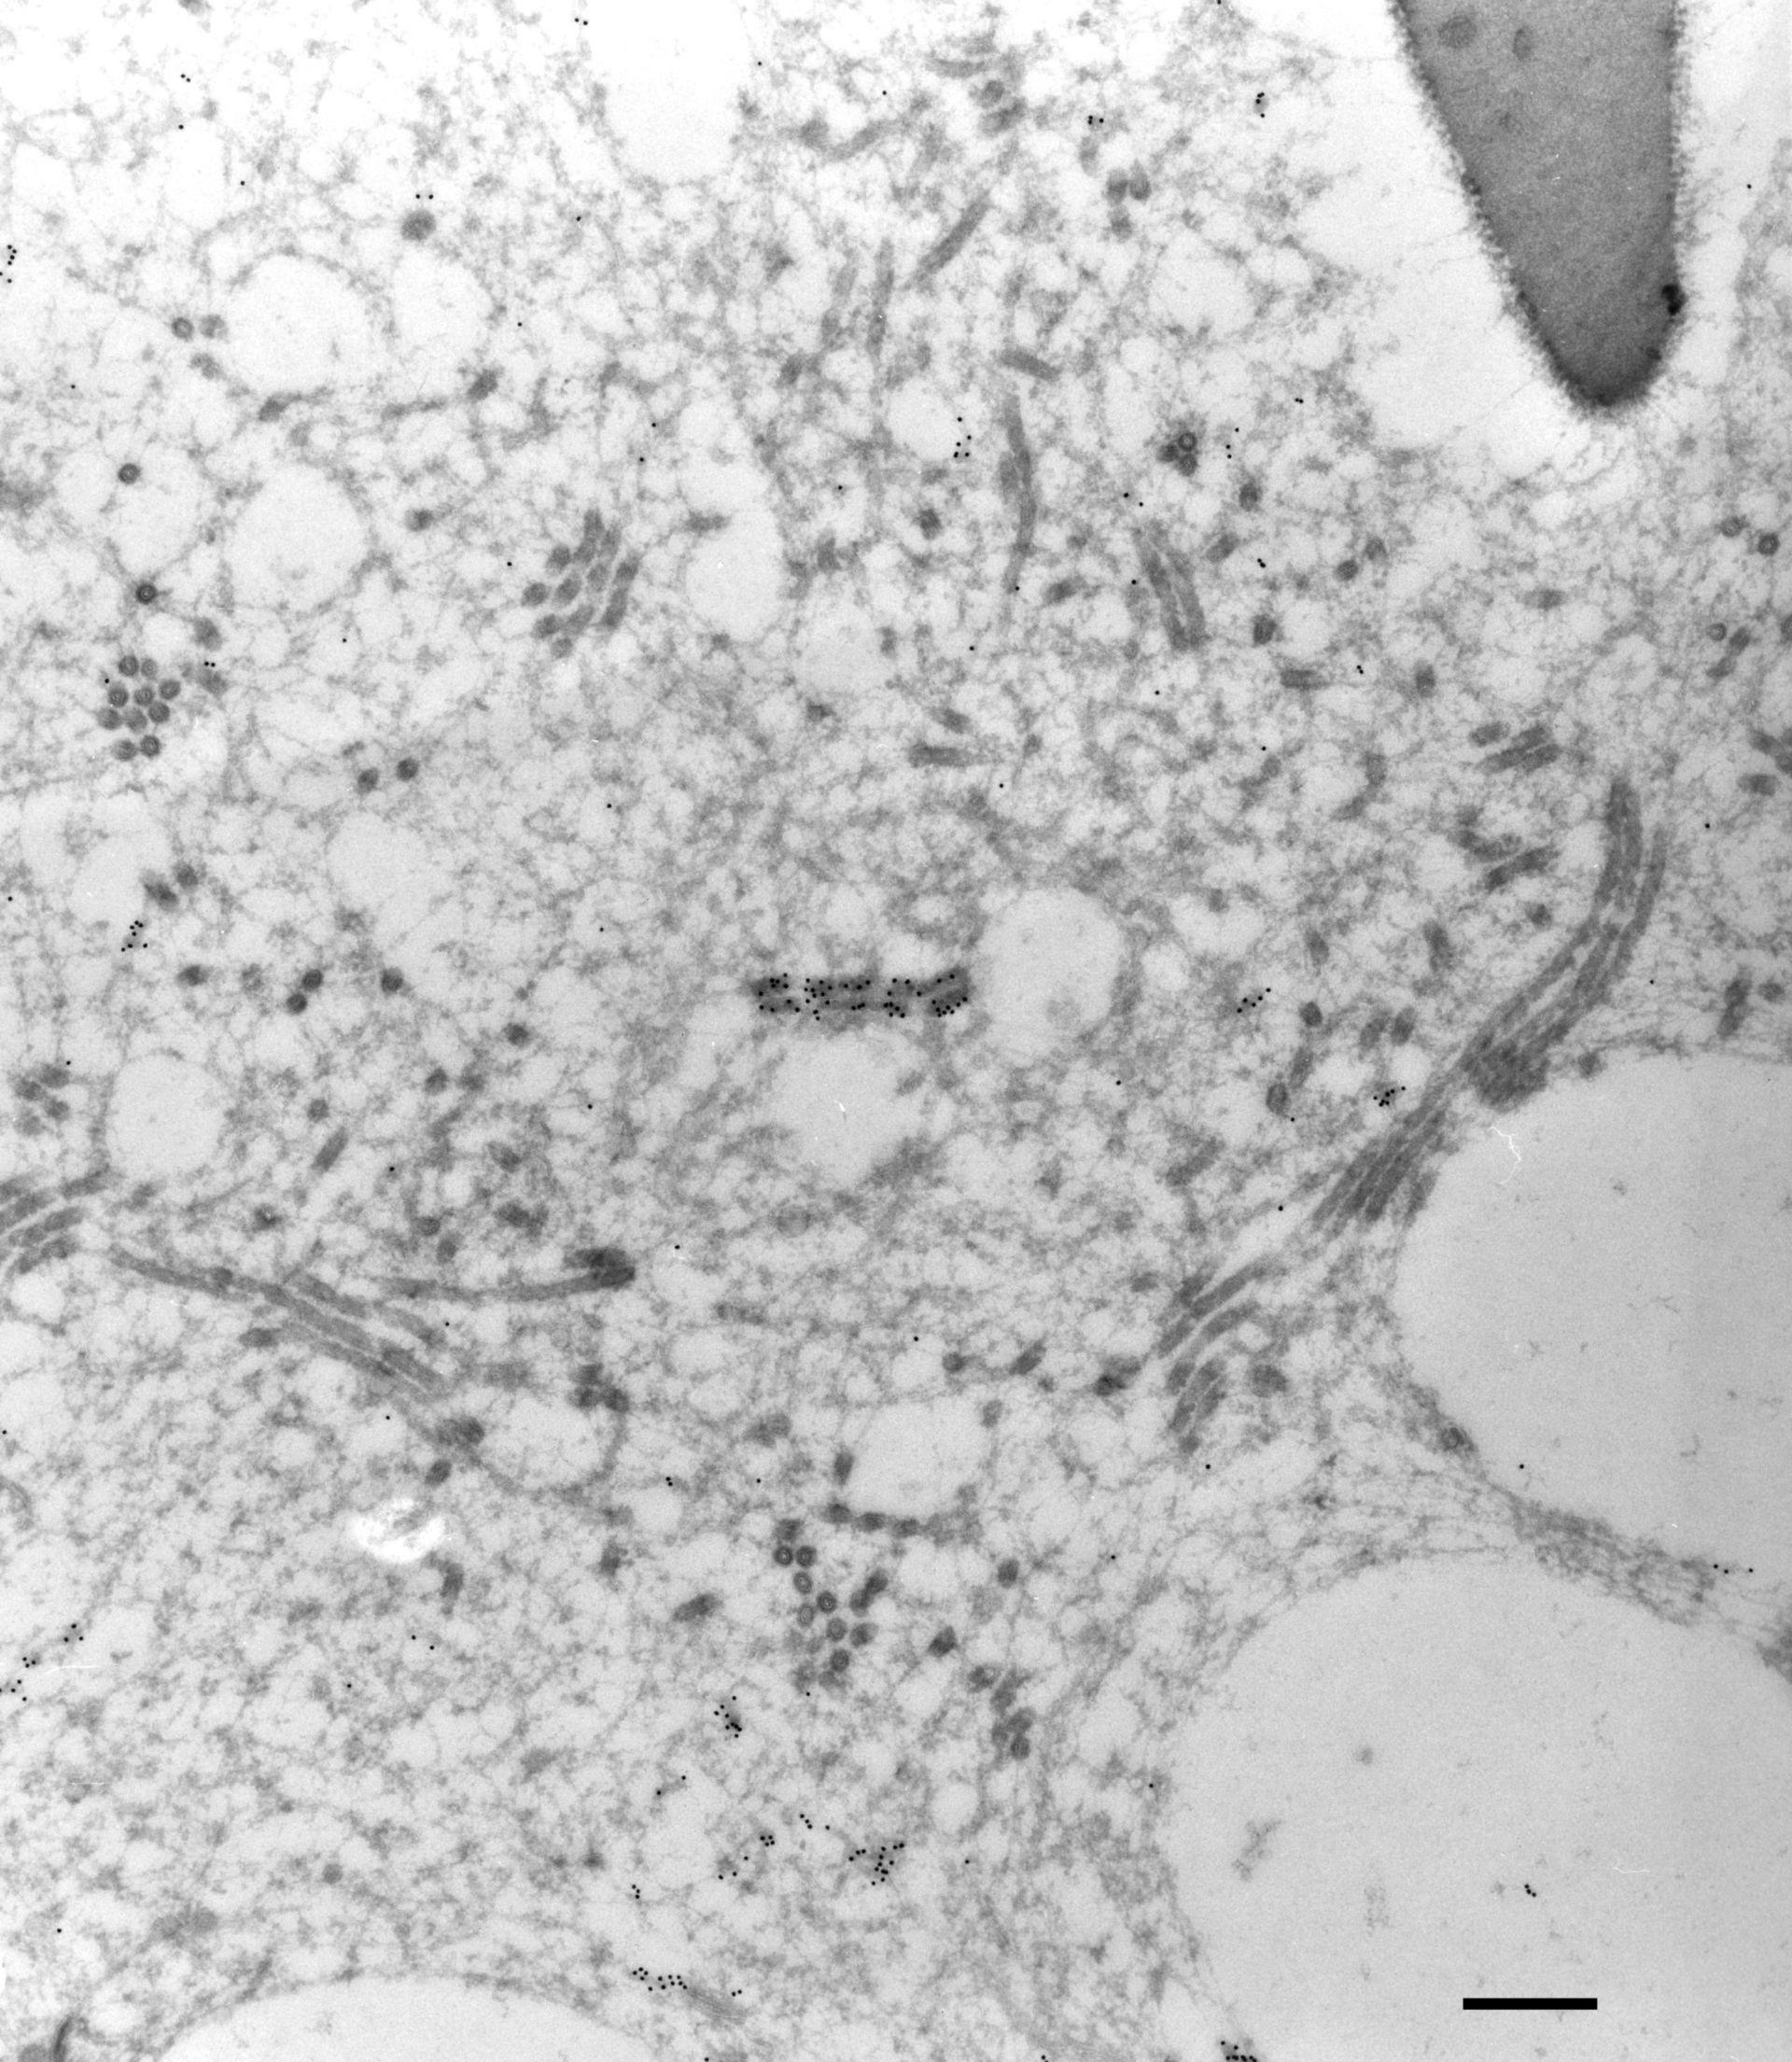 Paramecium multimicronucleatum (Cytoplasmic microtubule) - CIL:27152